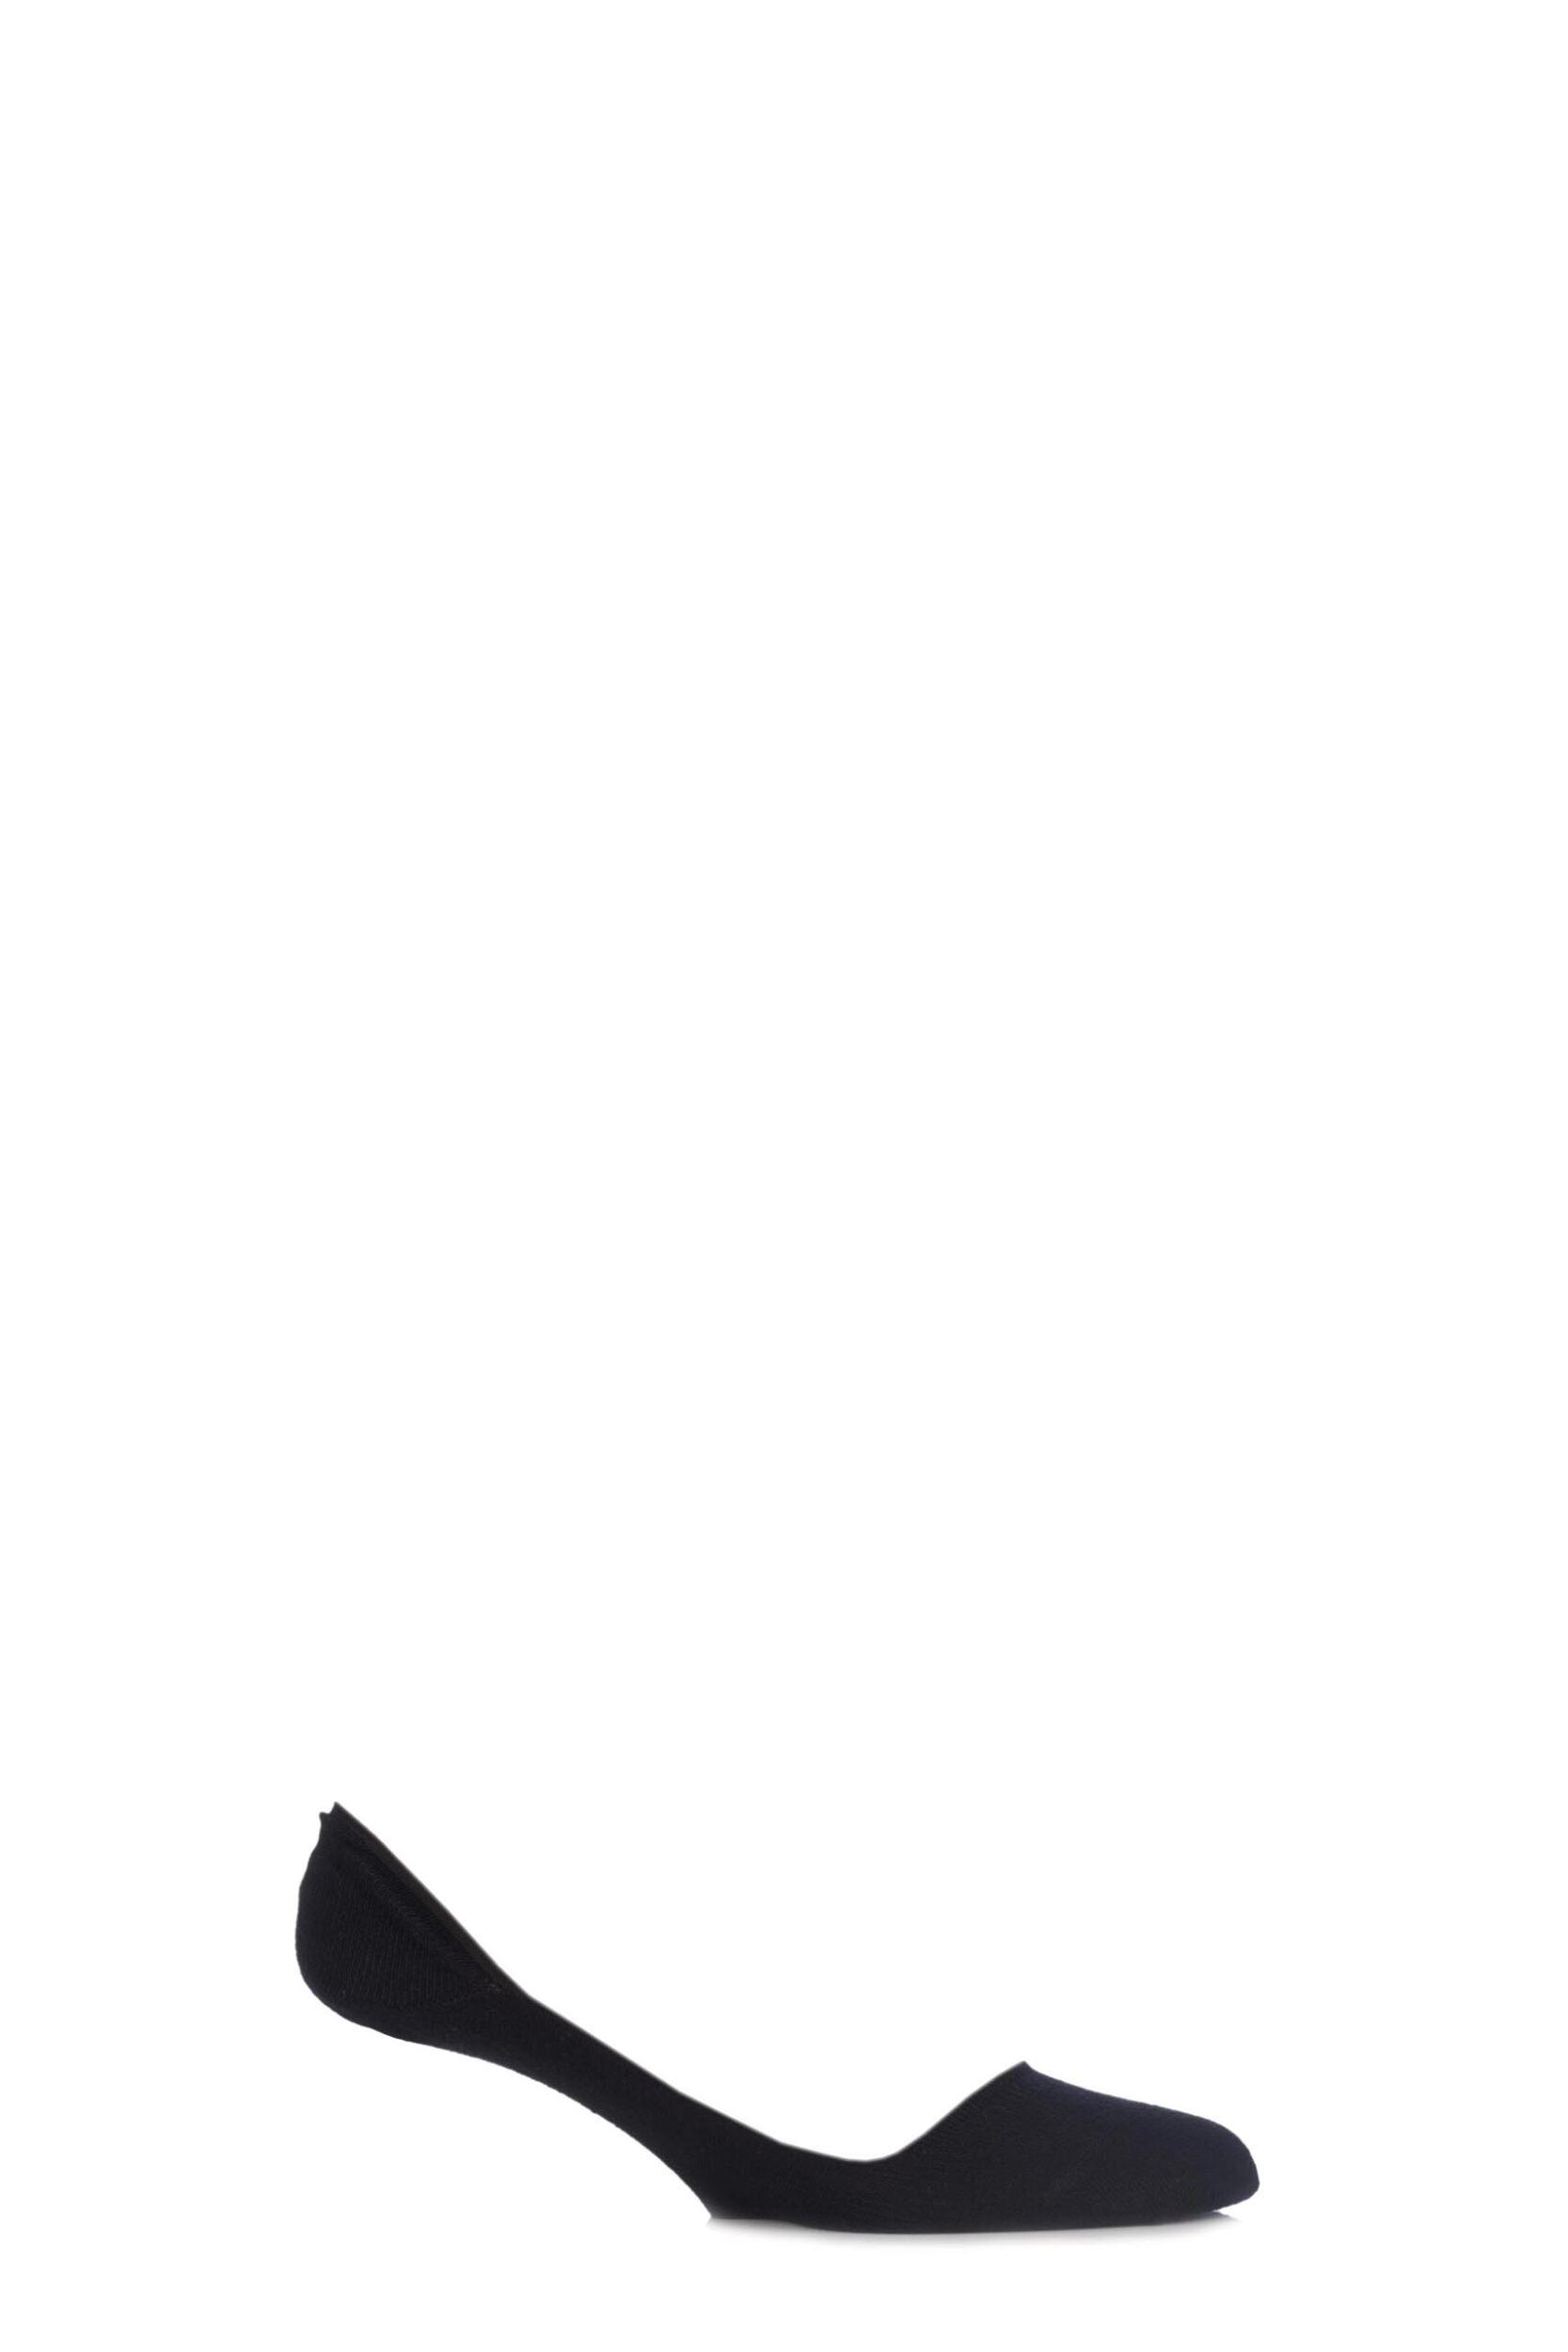 Mens Invisible 1 Pair Hugo Boss Plain Invisible Mens Shoe Liners e68b6e